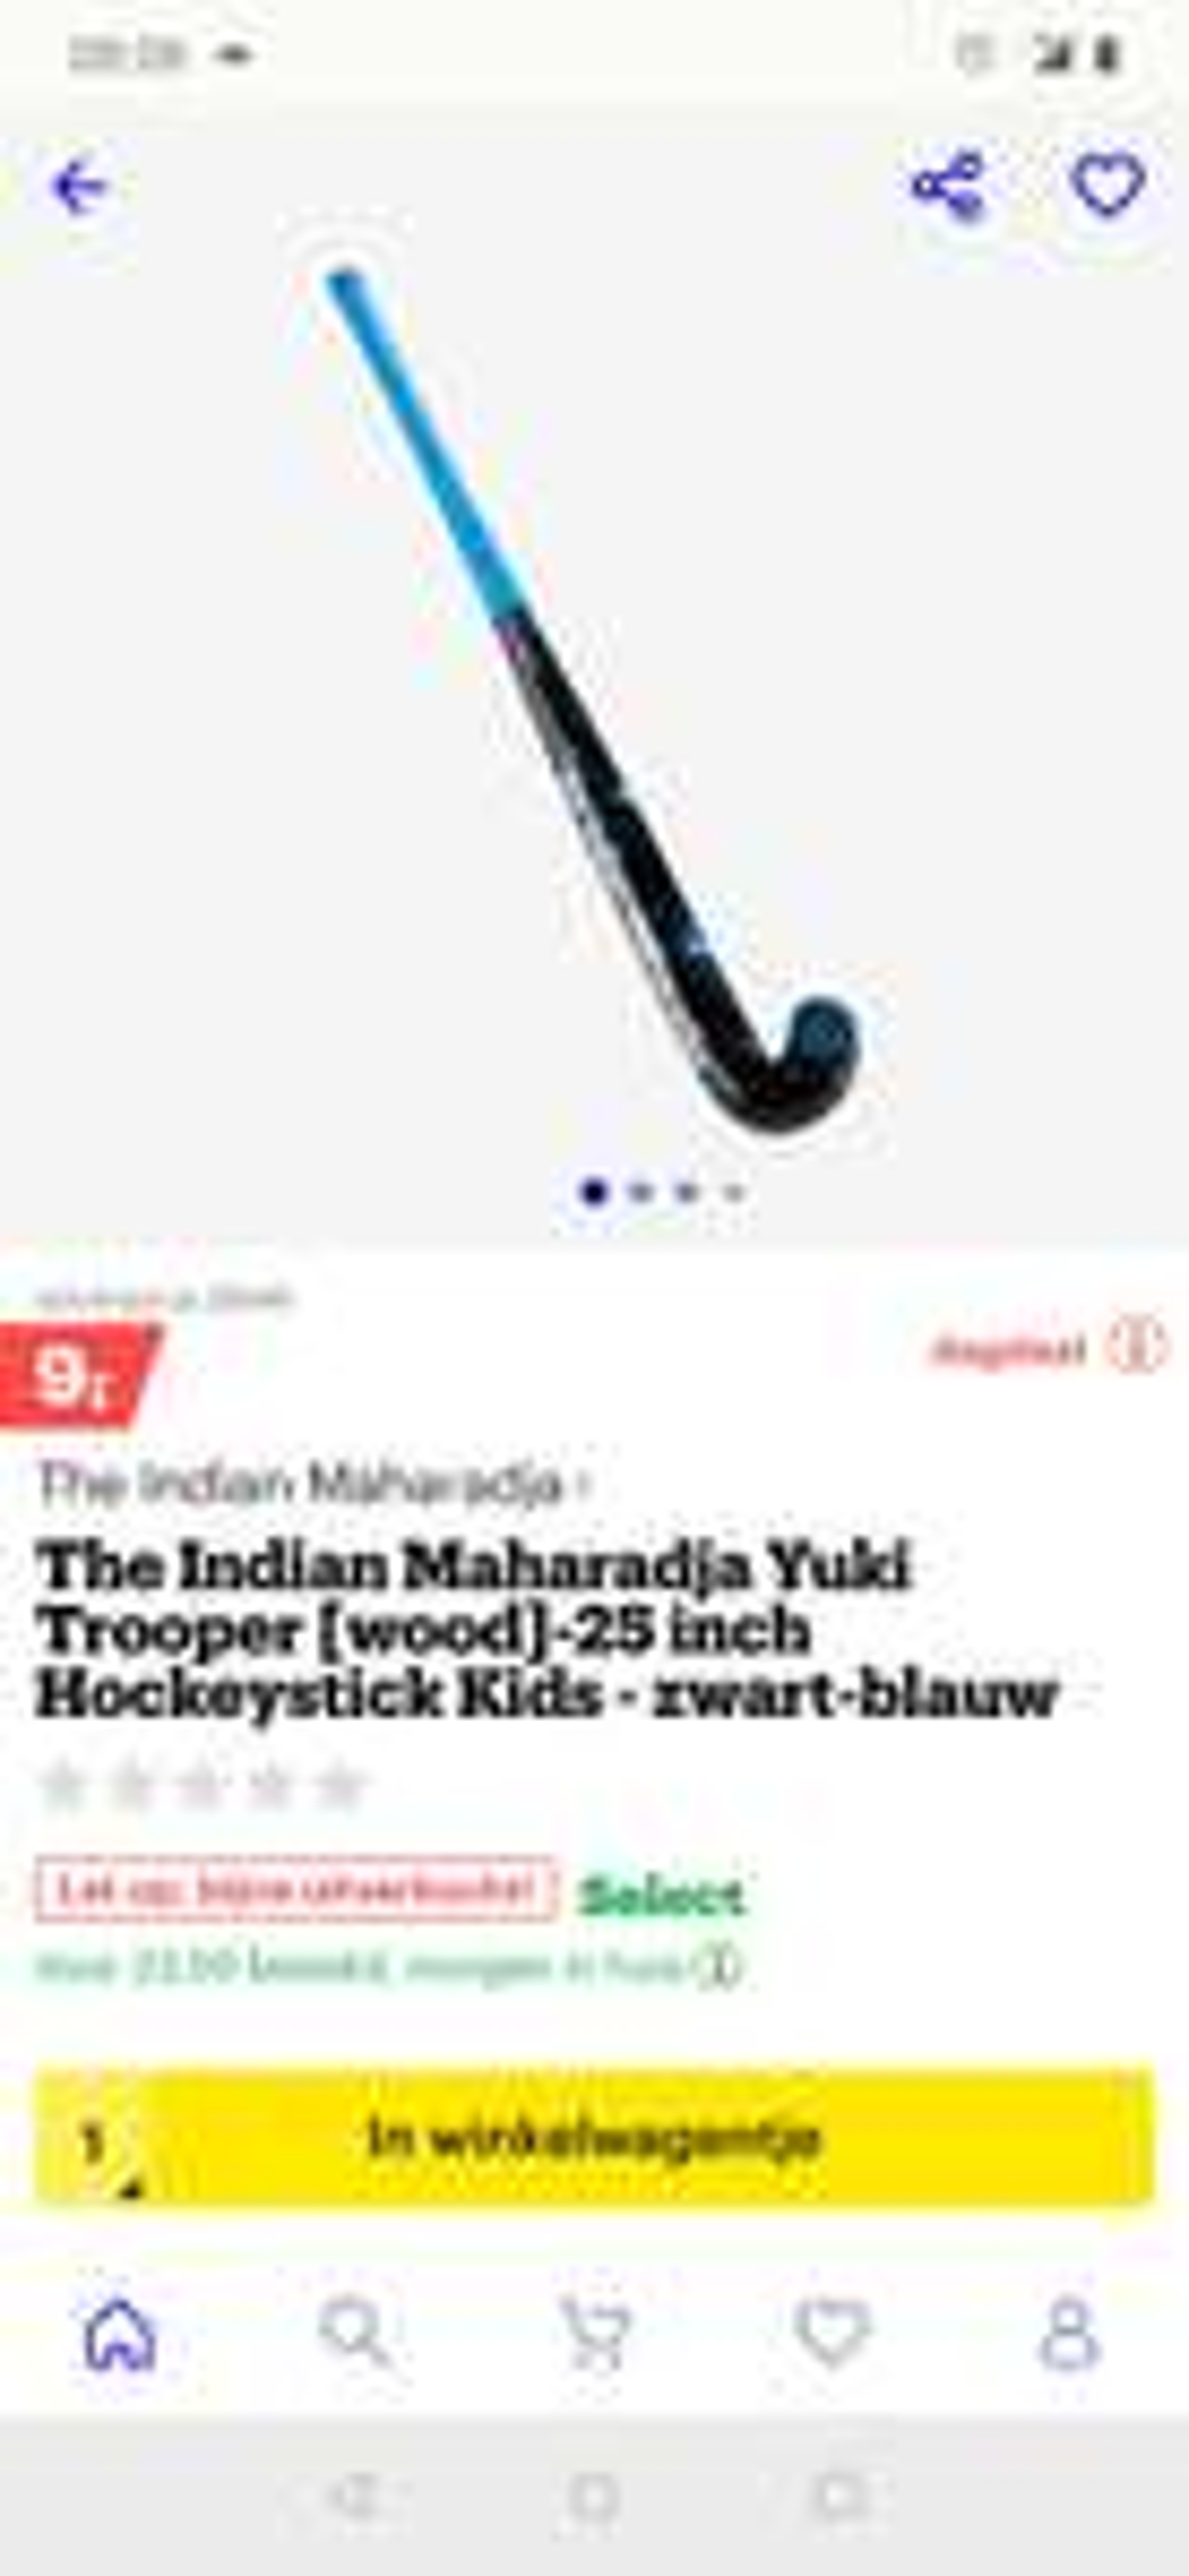 The Indian Maharadja Yuki Trooper hockeystick trooper